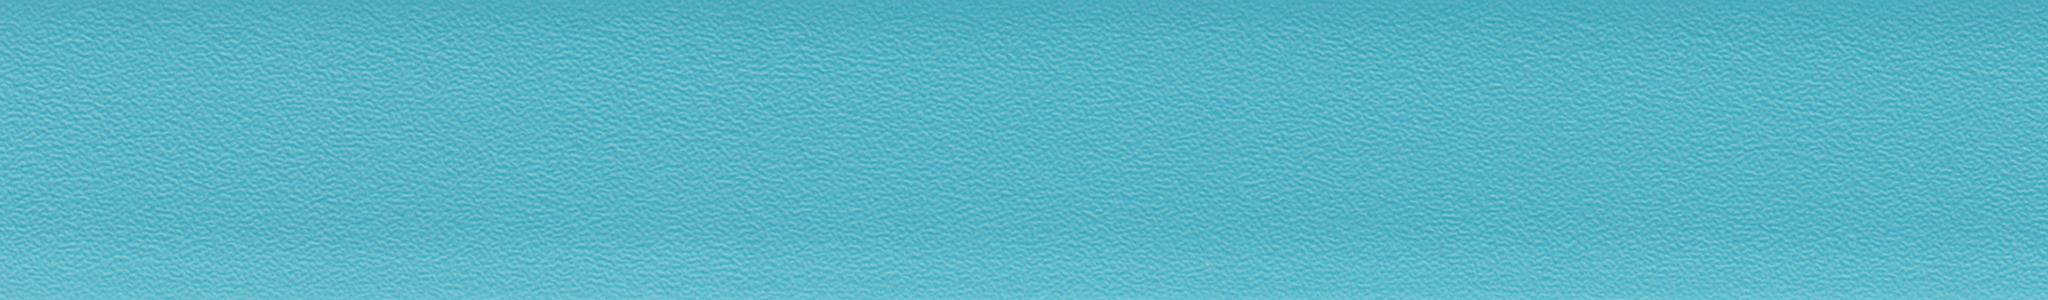 HU 157173 ABS hrana modrá aqua perla 101